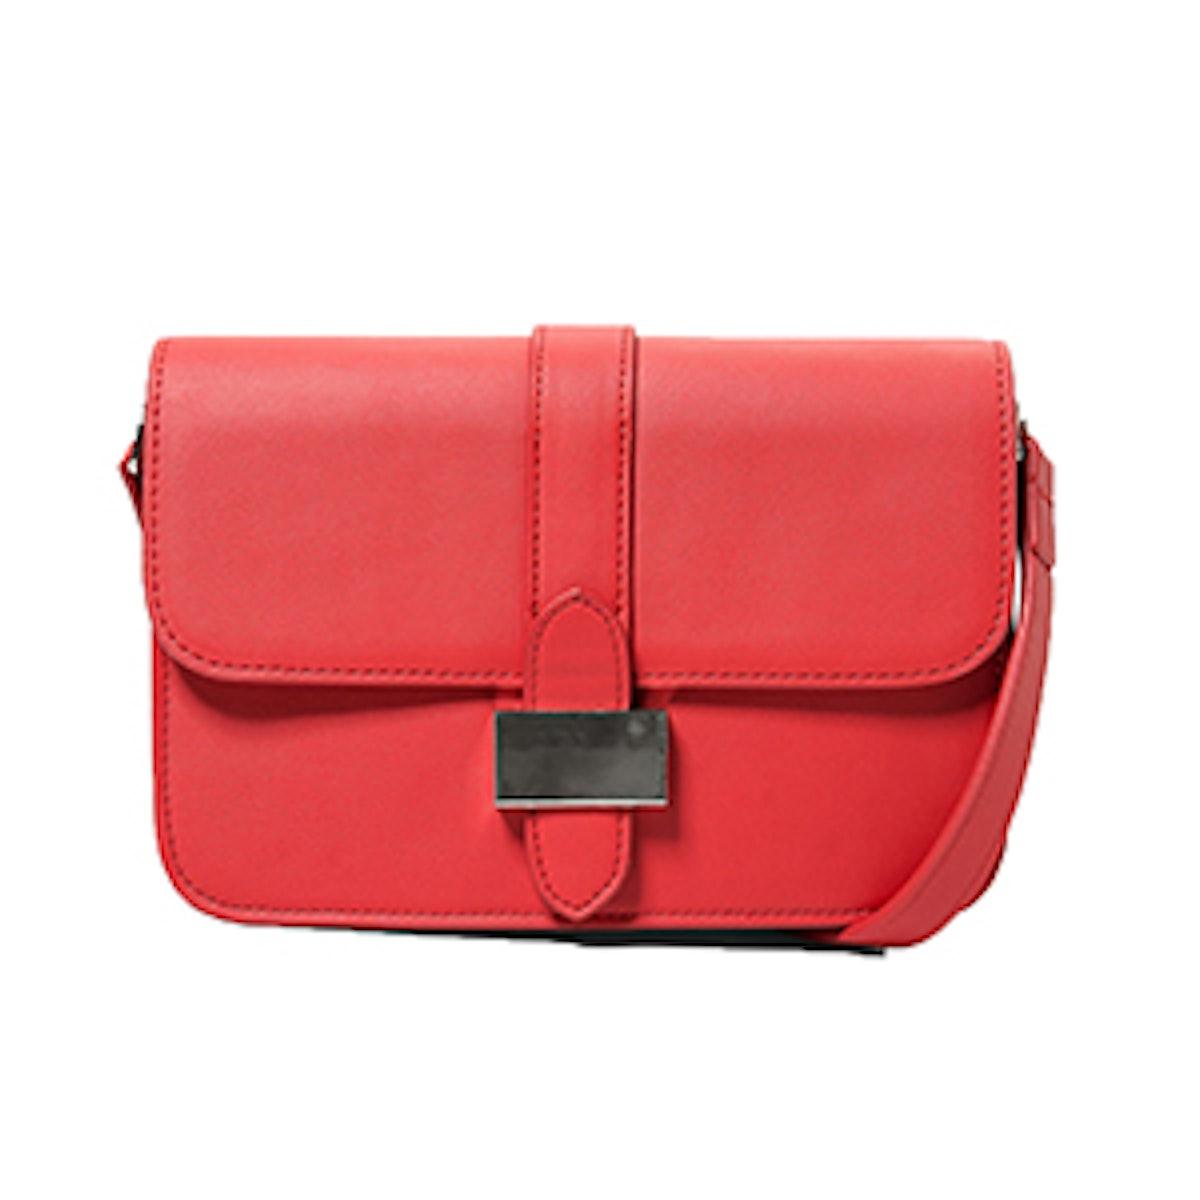 Buckle Cross Body Bag